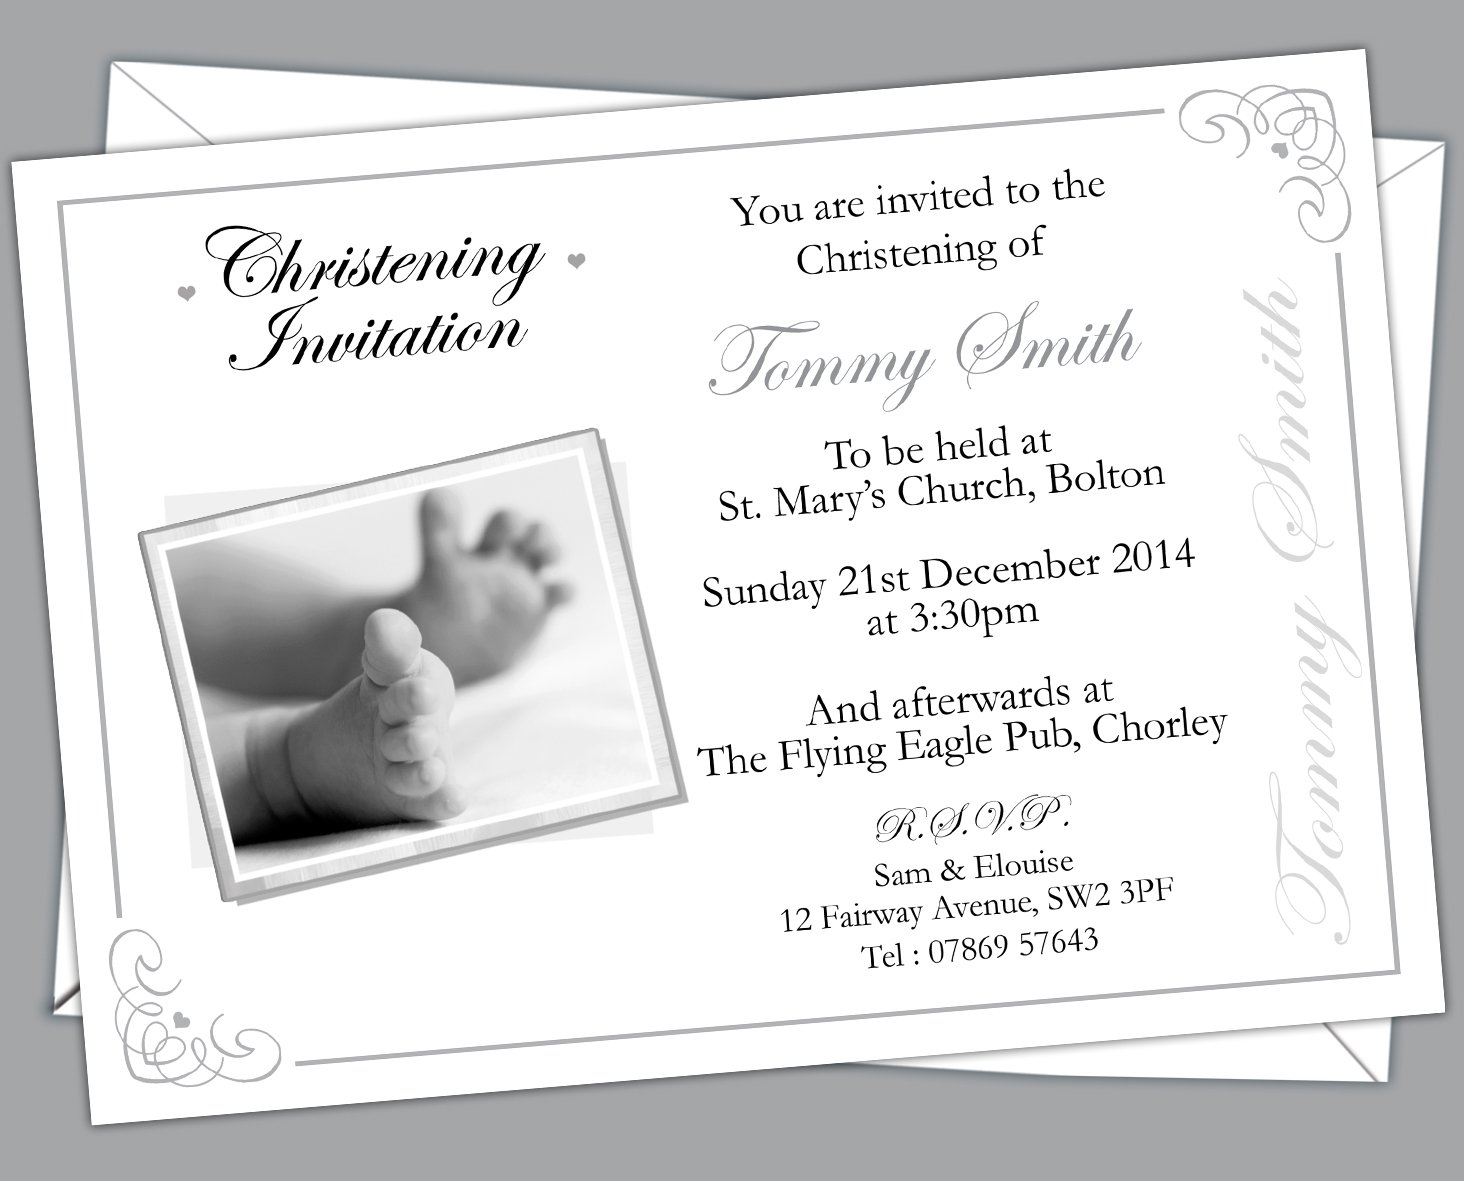 Baptism Invitations Pack of 100 Design Code: CBG 015 Personalised Christening